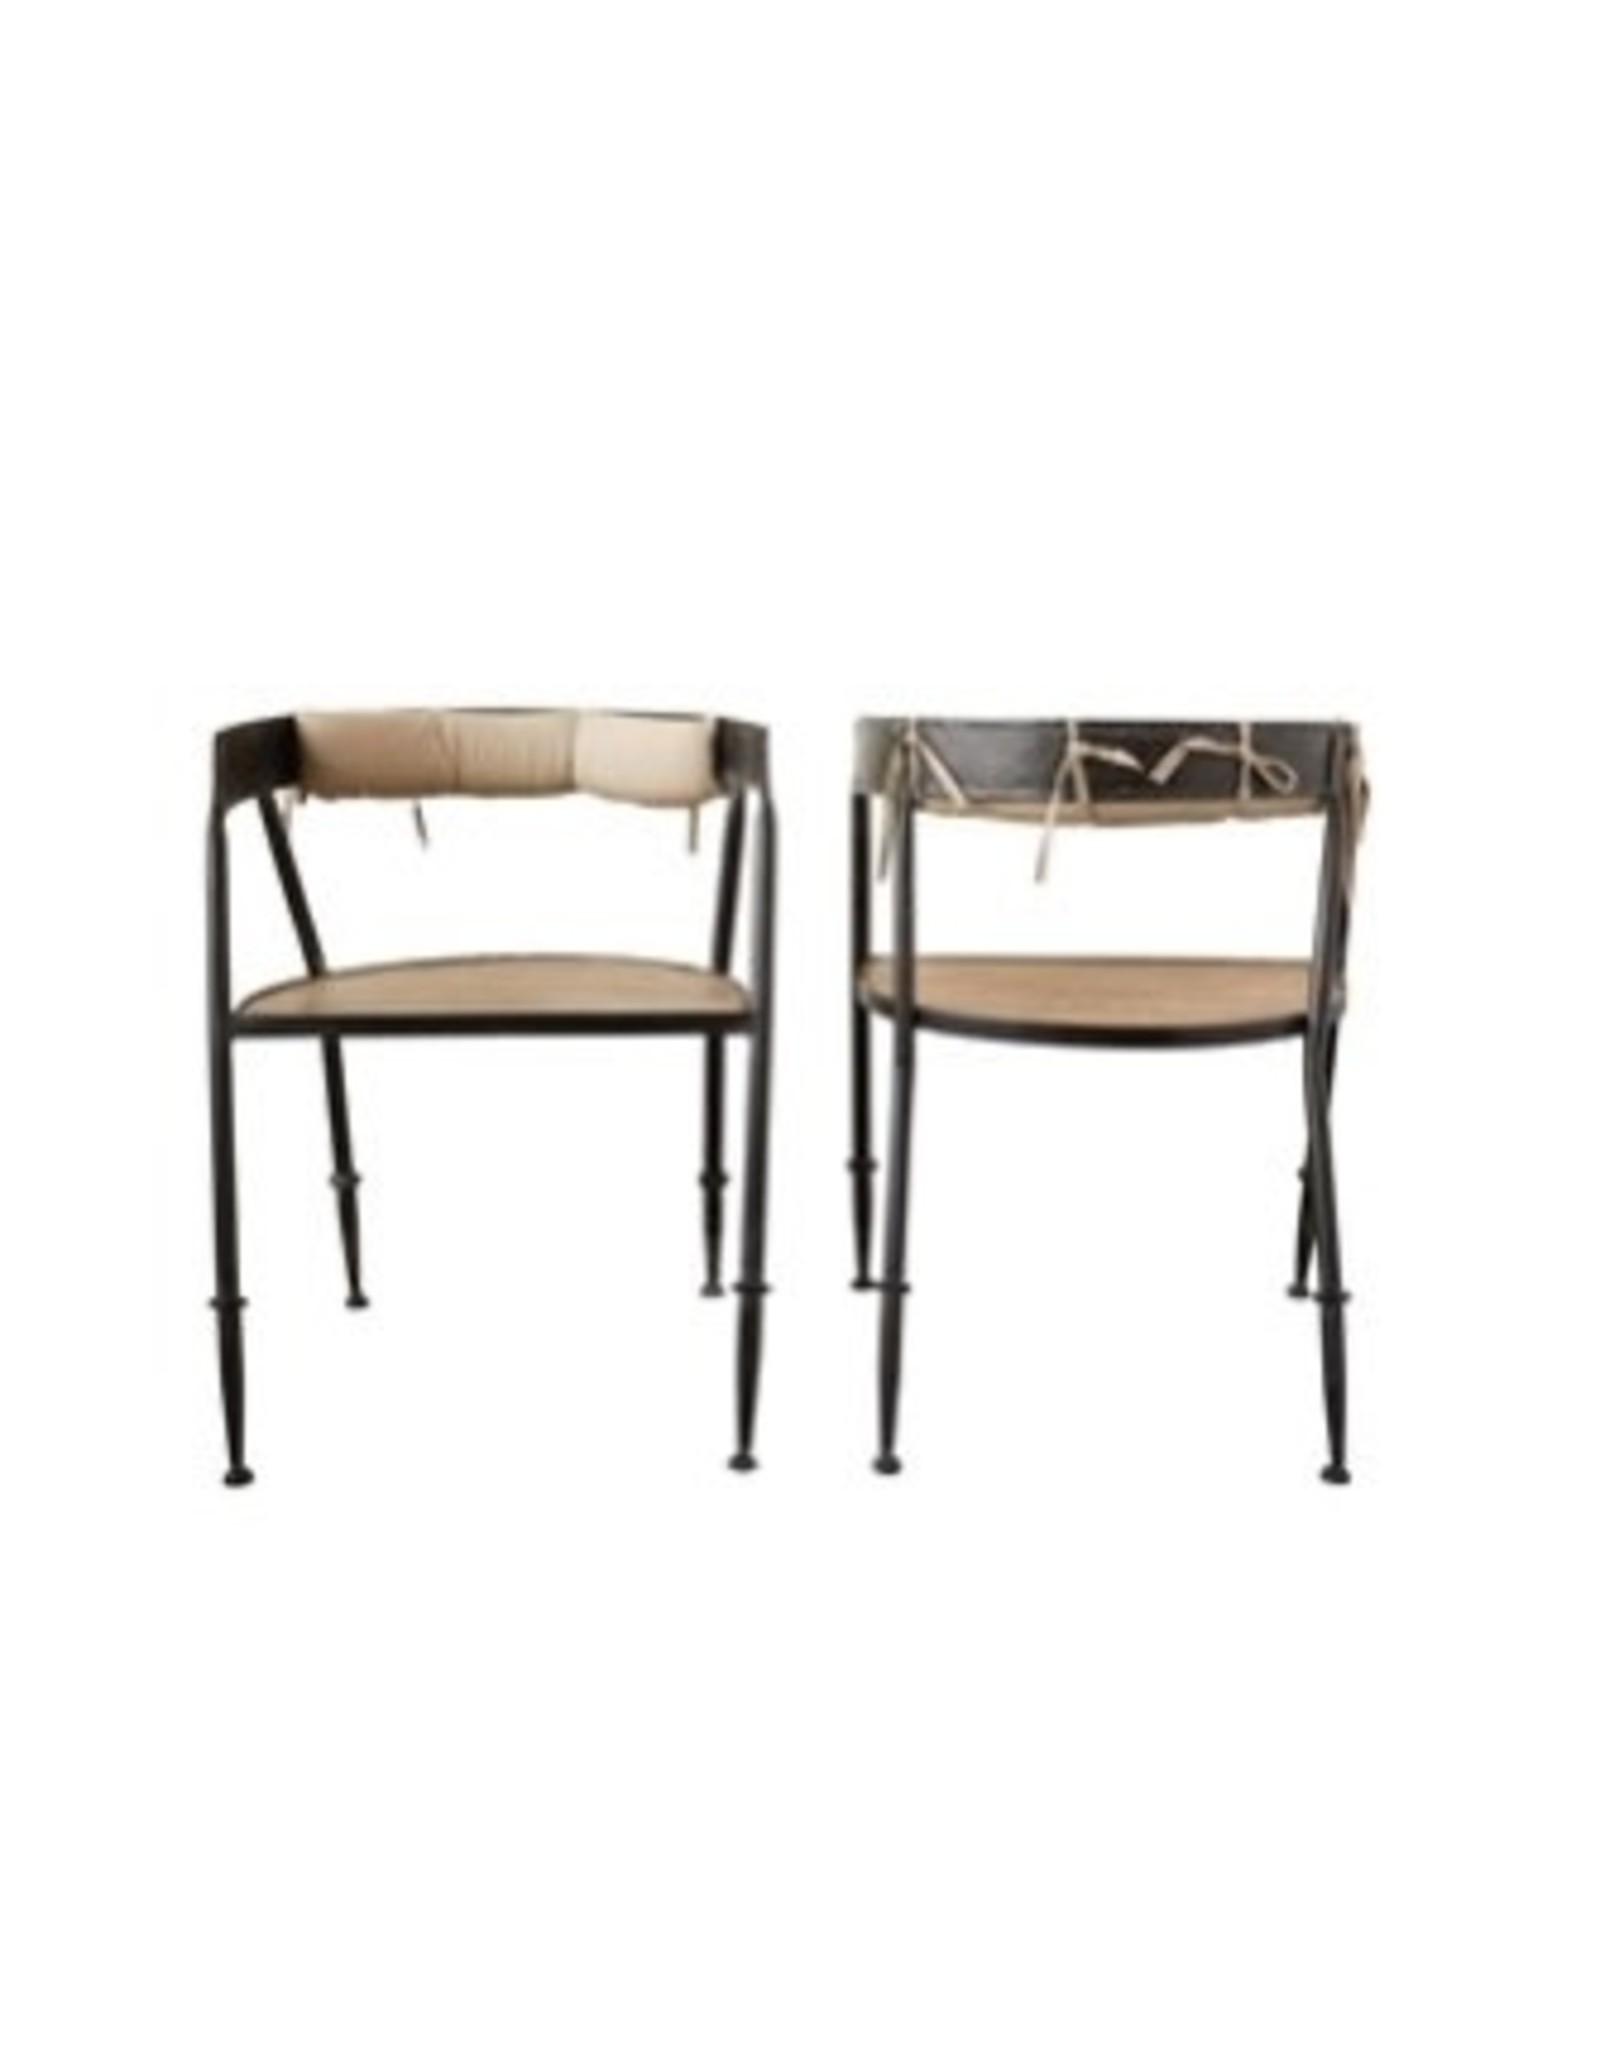 "Creative Co-op 31 1/2"" Metal Chair w/Wood Seat"